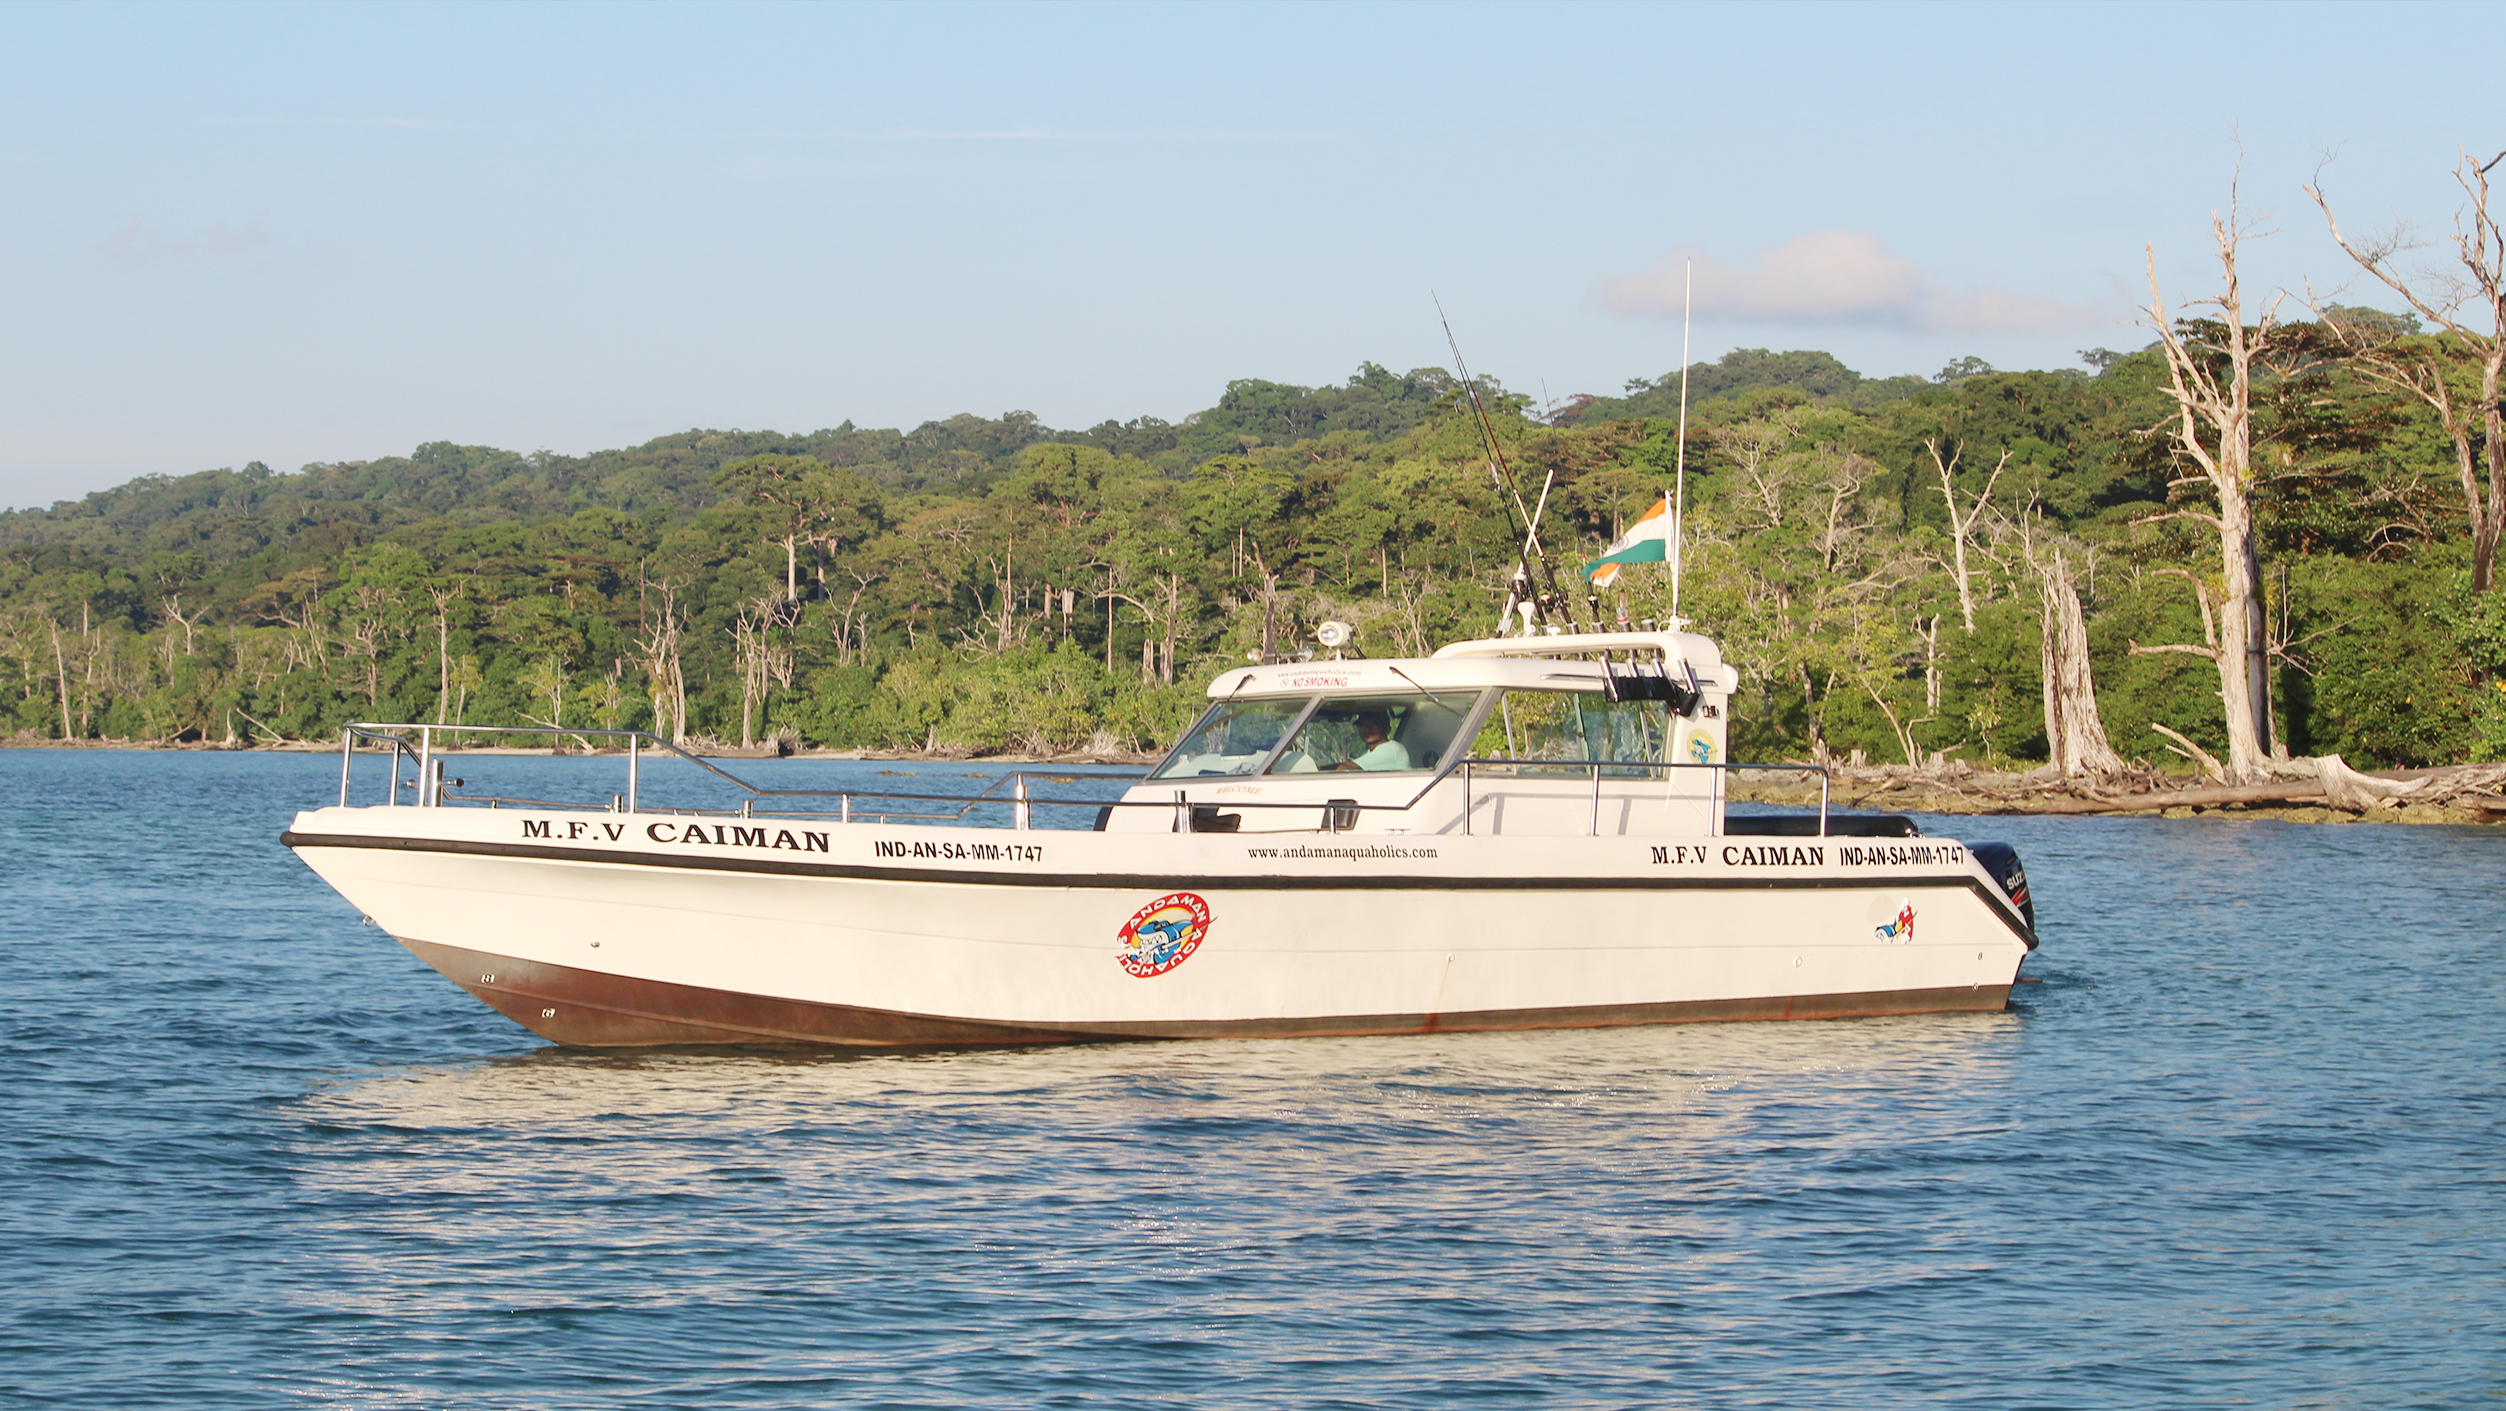 MFV Caiman fishing boat in india elephant beach